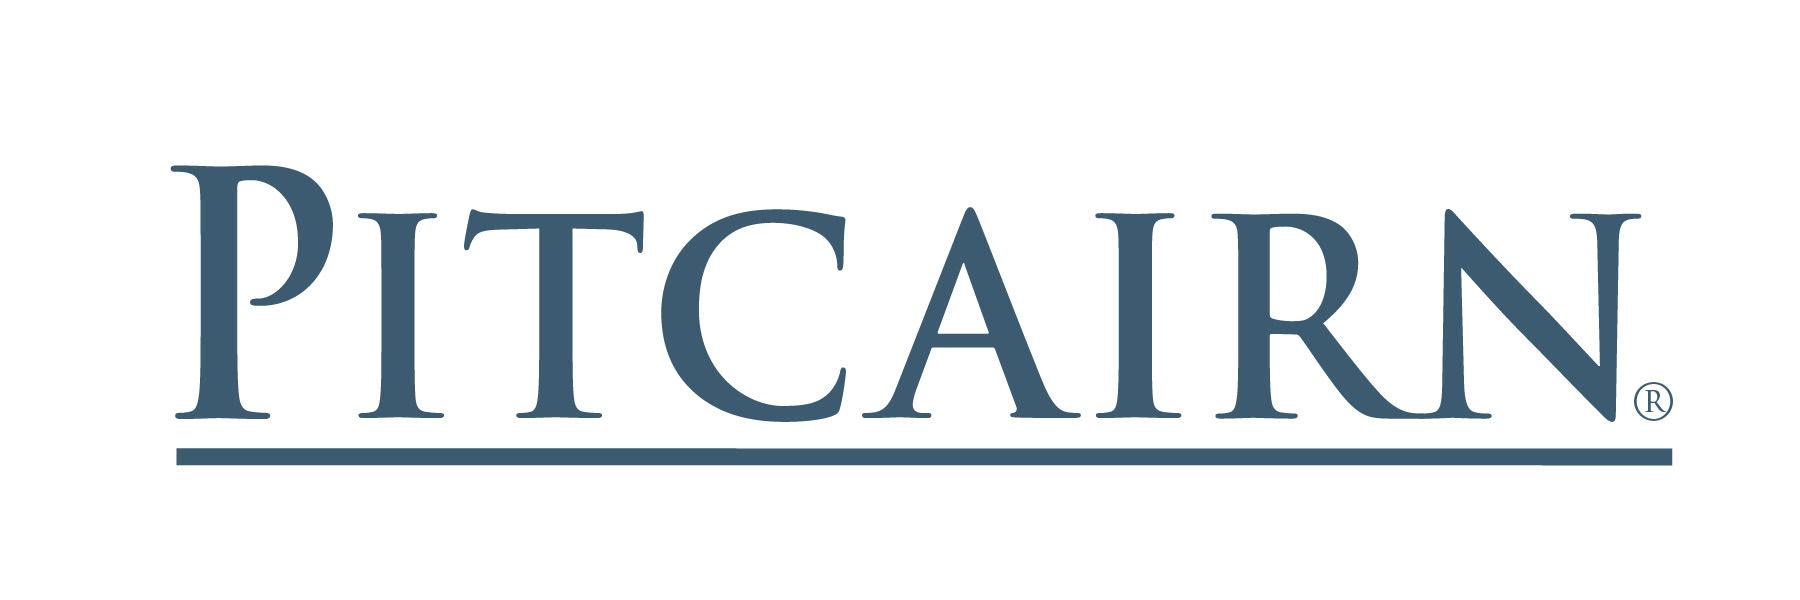 Pitcairn logo